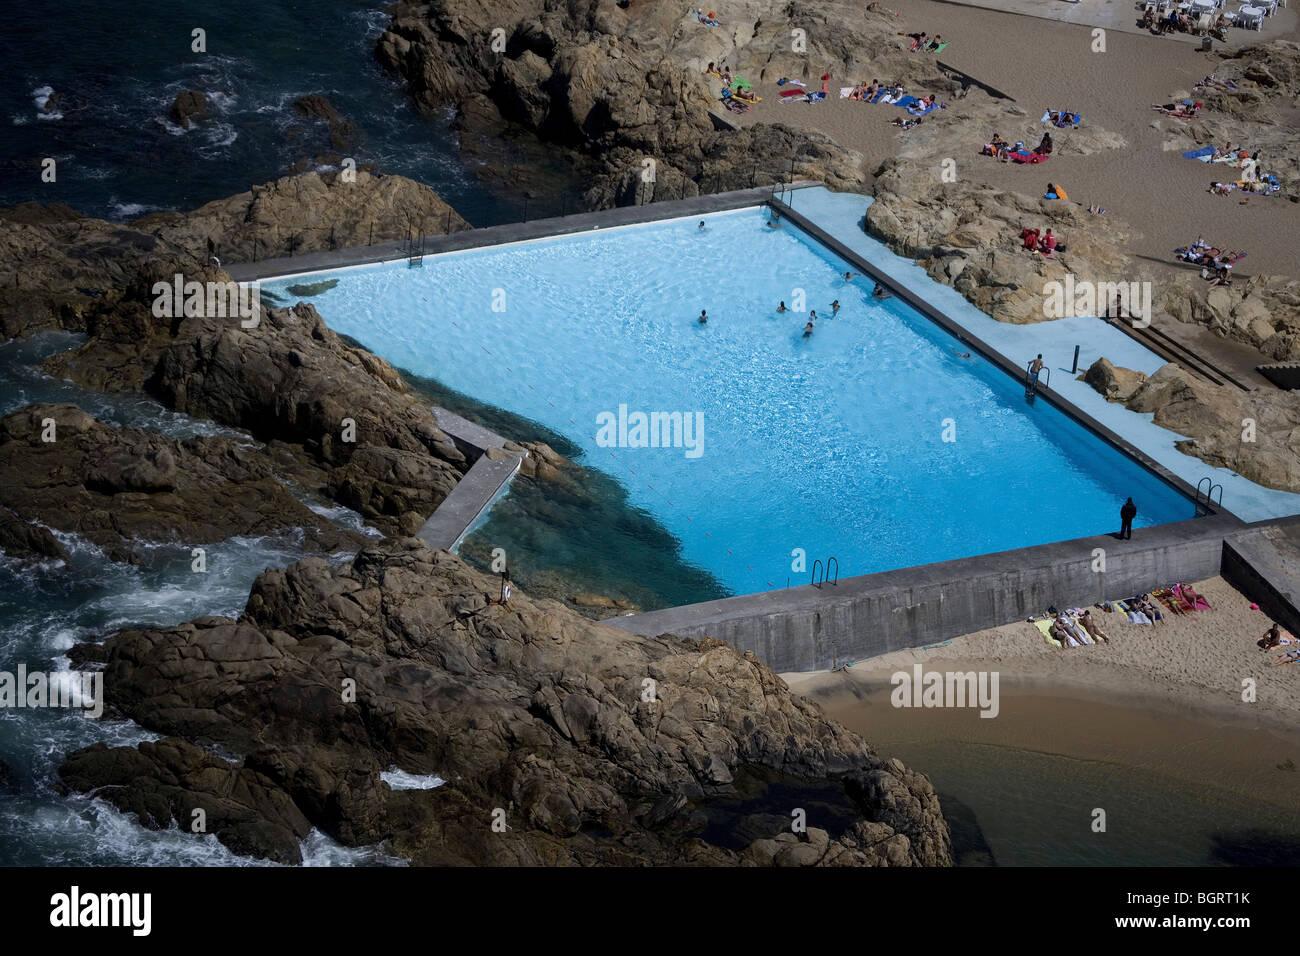 Leca Swimming Pool Matosinhos Porto Portugal 1966 Stock Photo Royalty Free Image 27568623